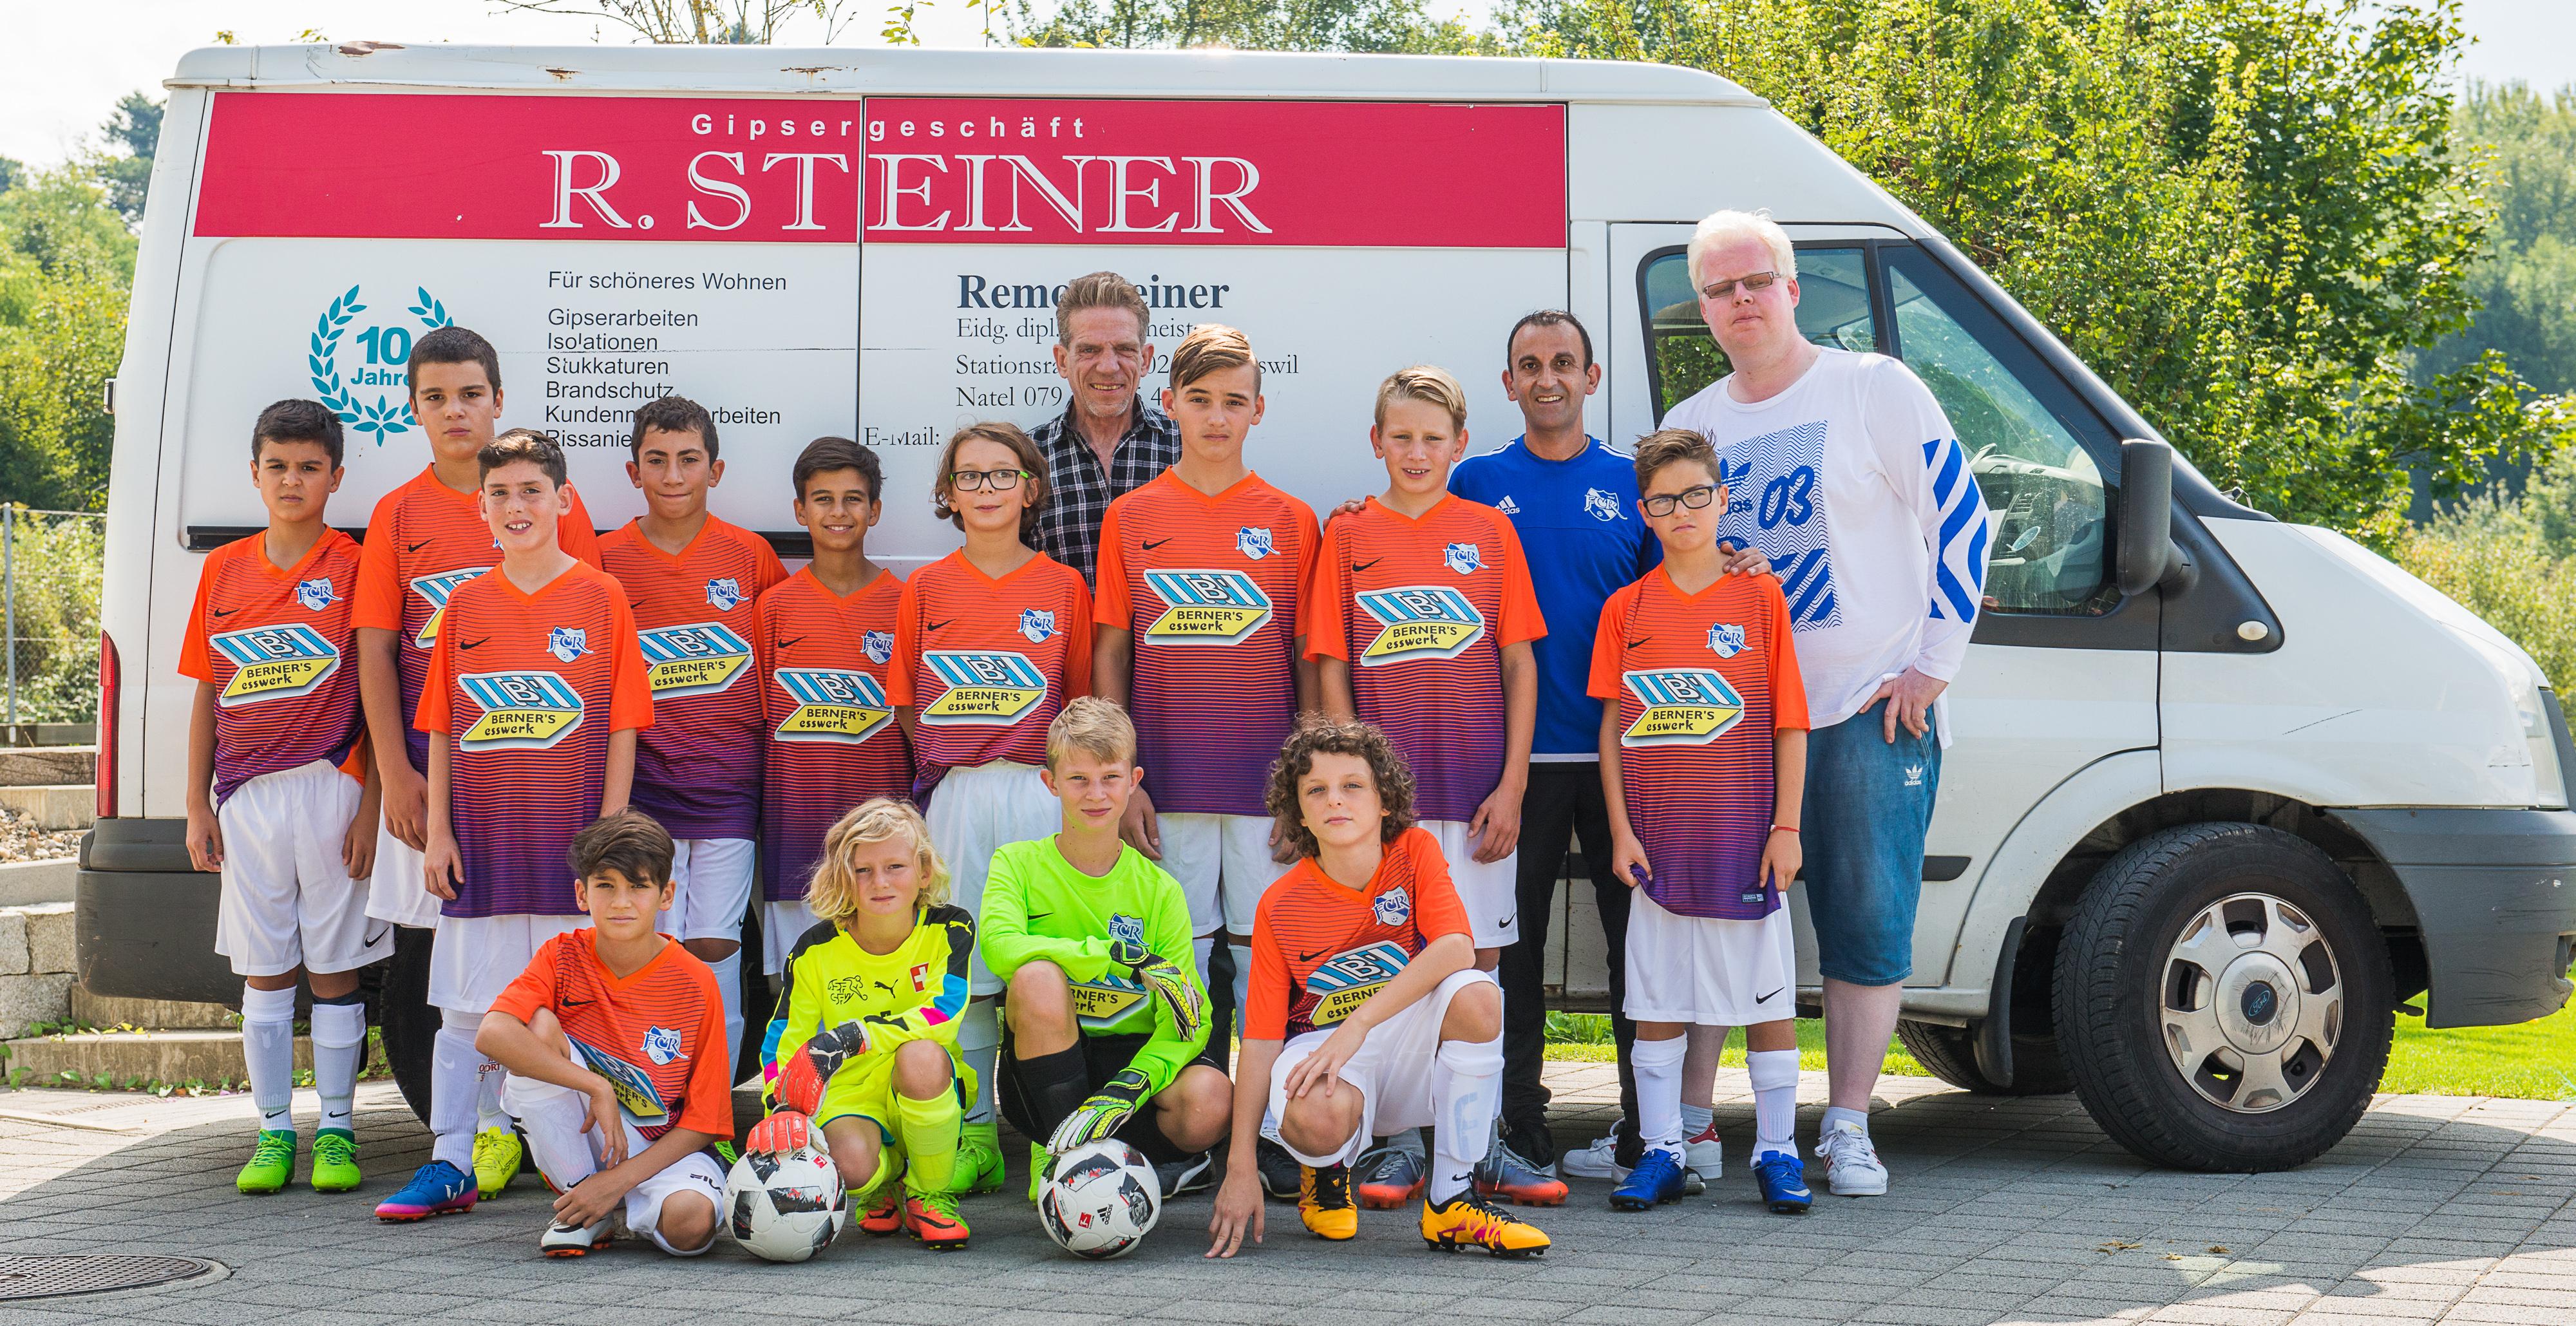 Sponsor-Da-RSteiner-1718